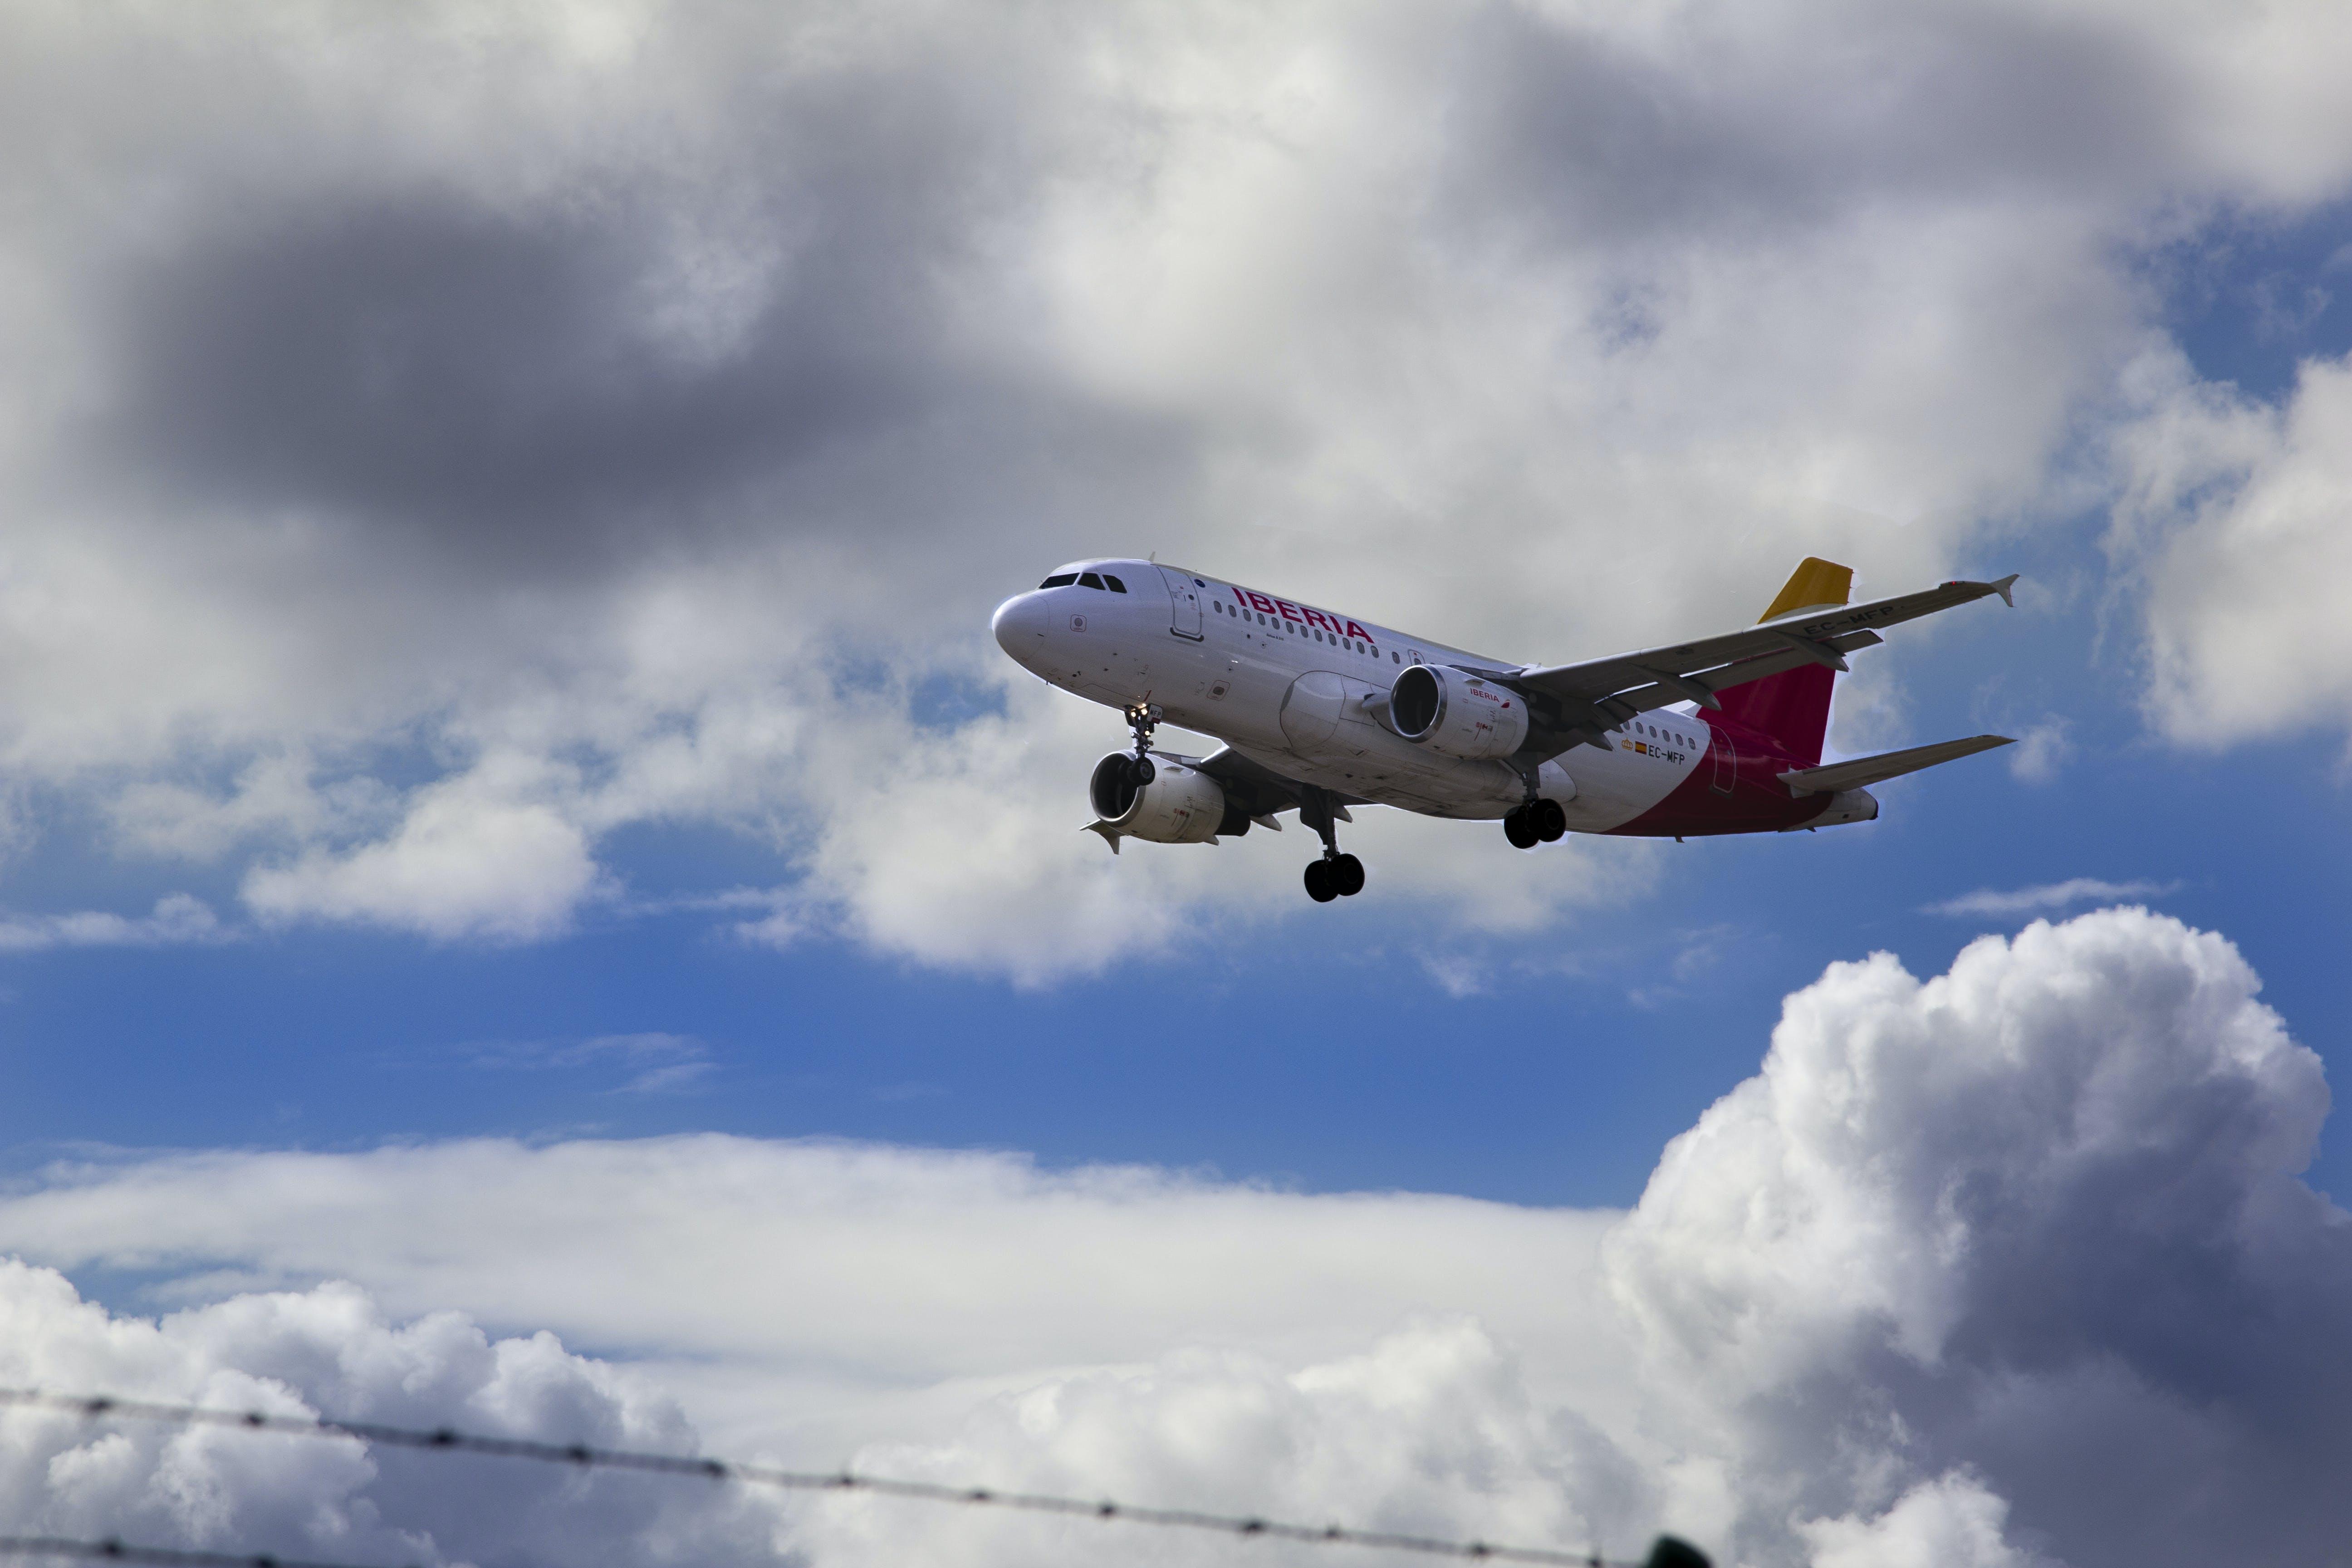 Free stock photo of Aeropuerto, avion, viaje, vuelo